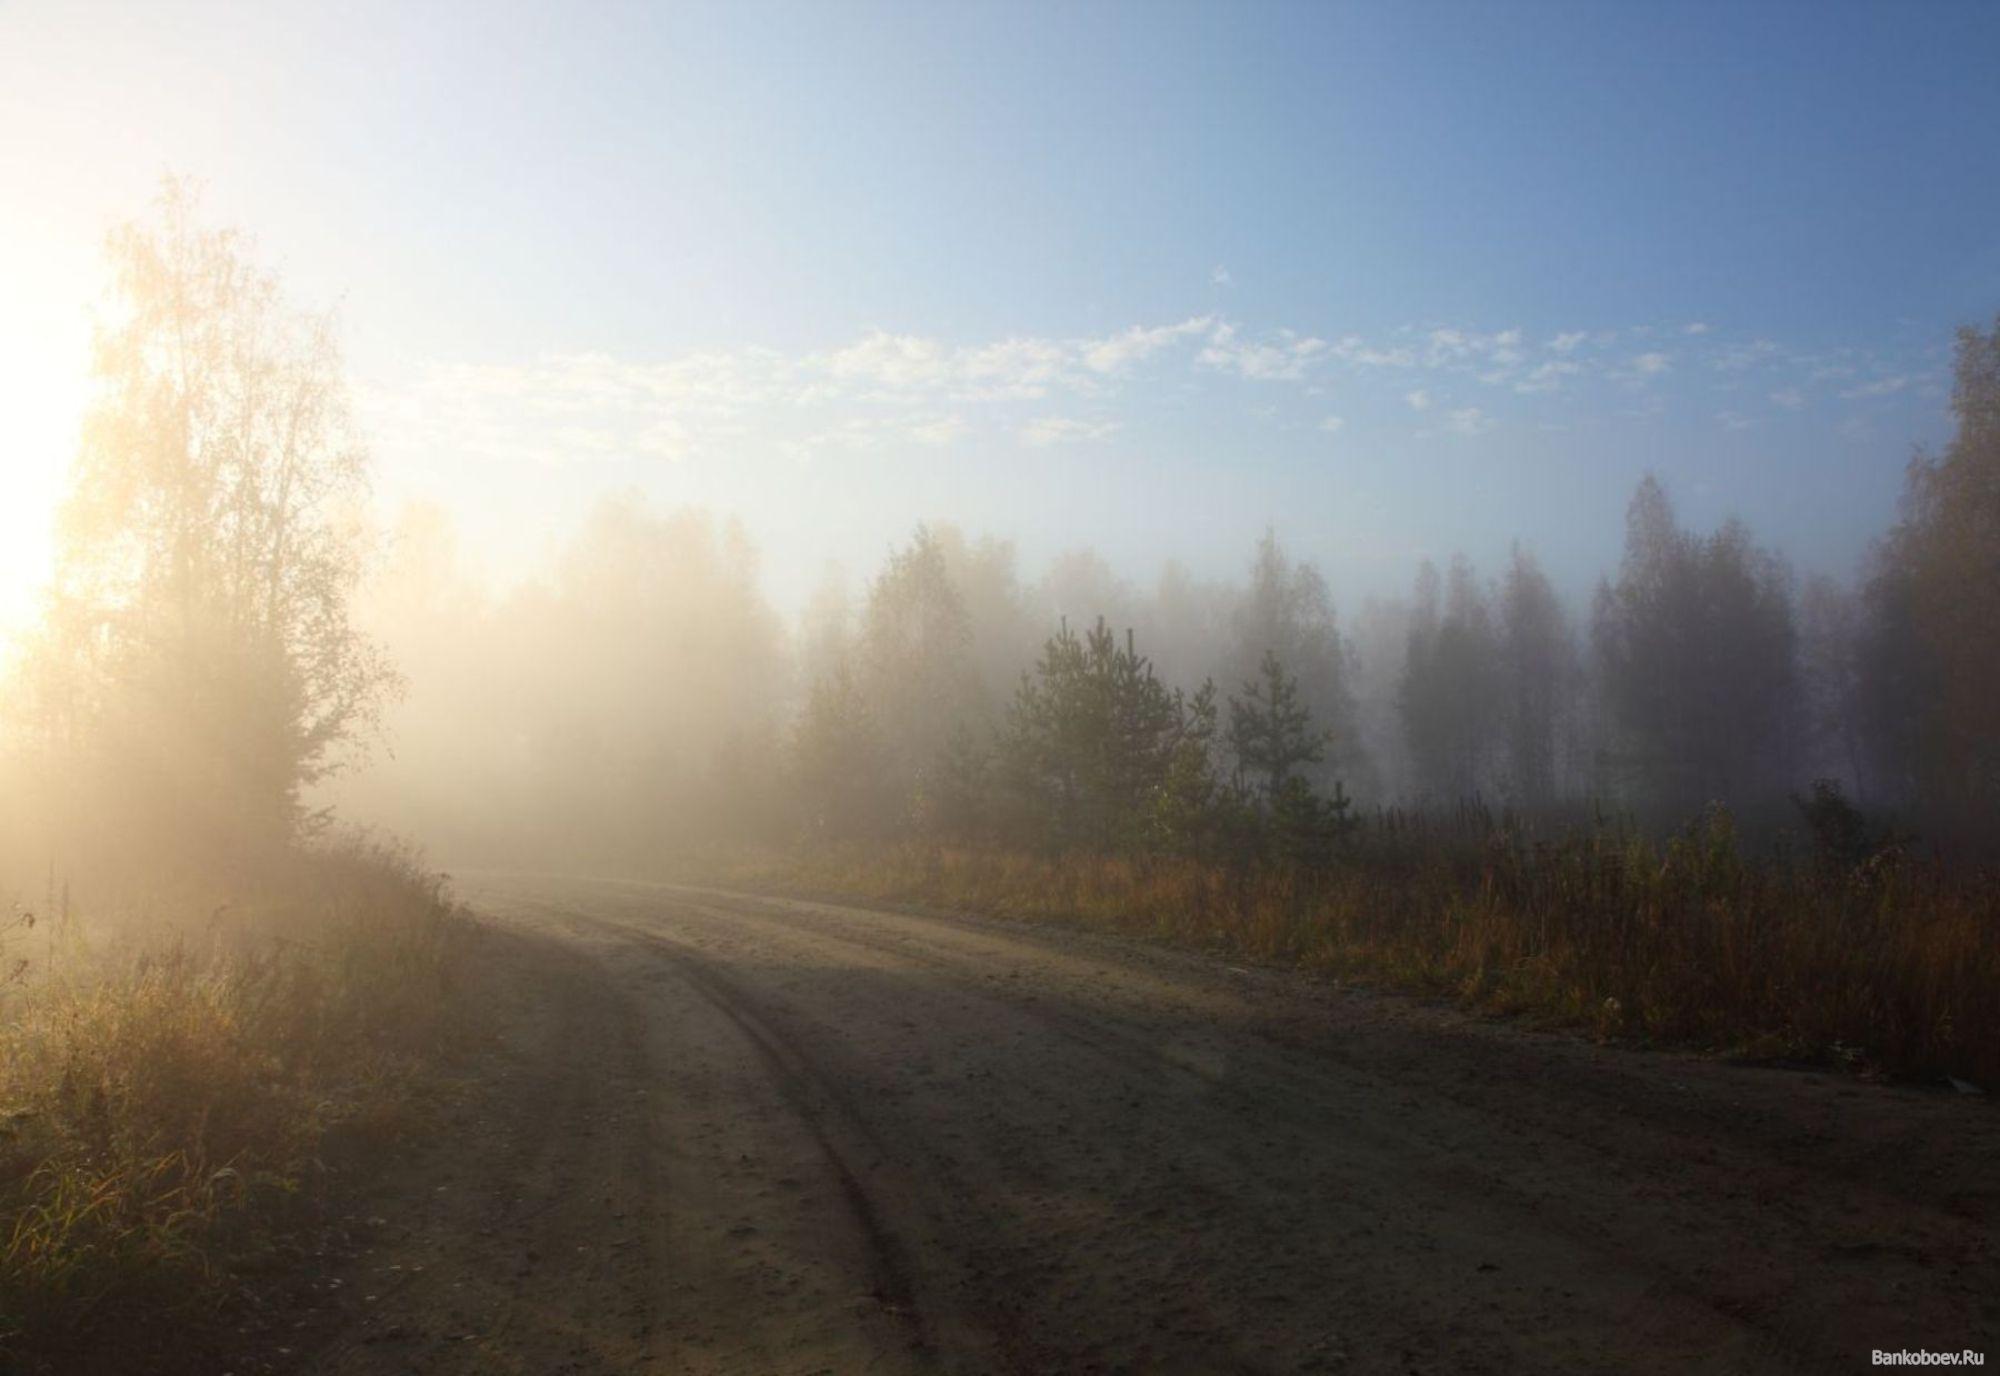 http://s2.uploads.ru/5LxGy.jpg